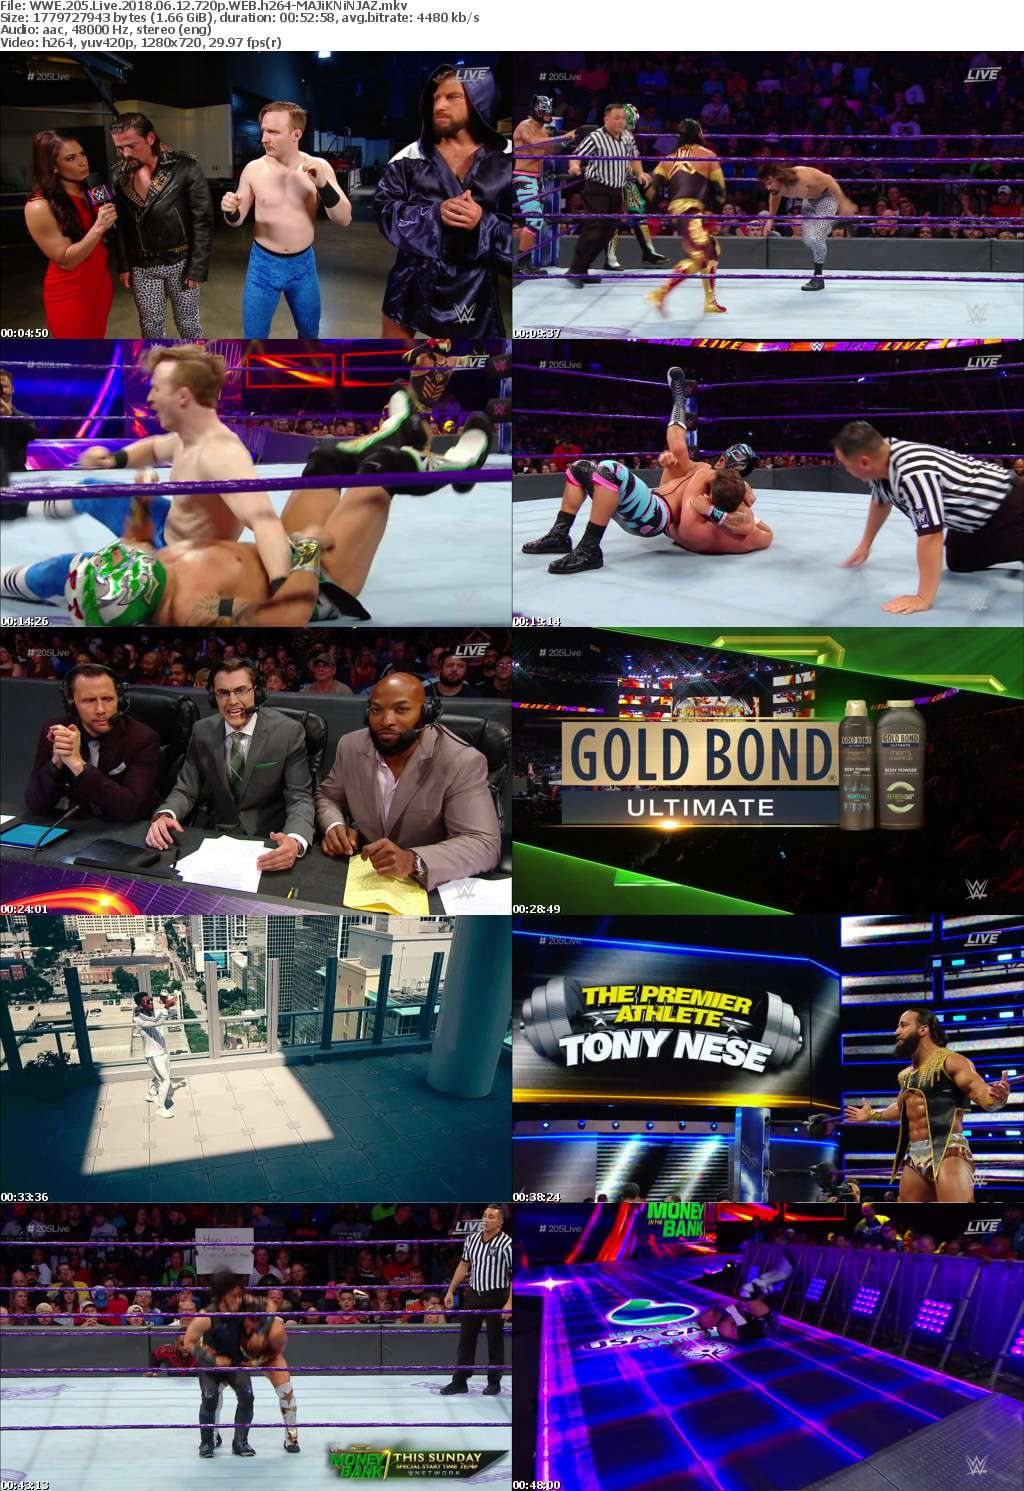 WWE 205 Live 2018 06 12 720p WEB h264-MAJiKNiNJAZ